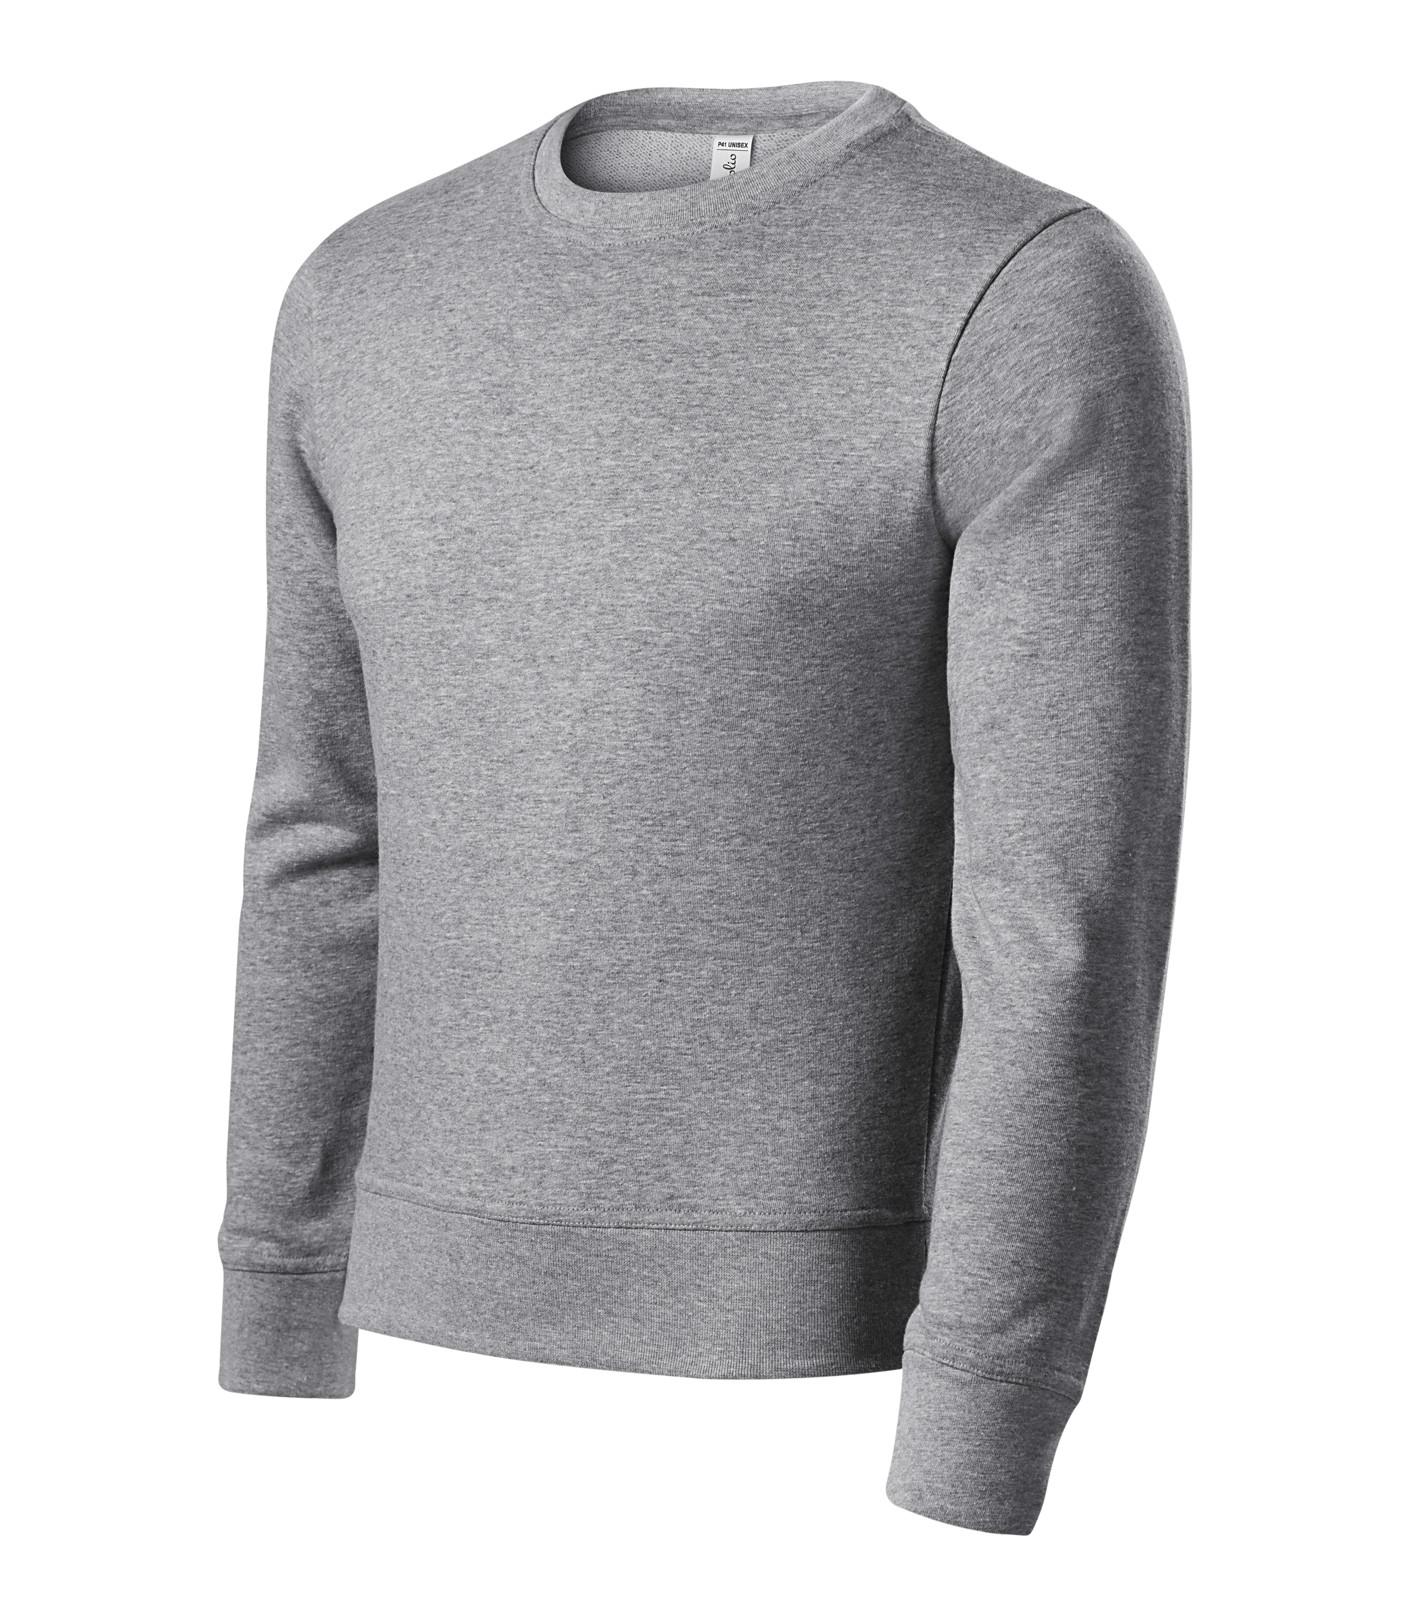 Sweatshirt unisex Piccolio Zero - Dark Gray Melange / 3XL